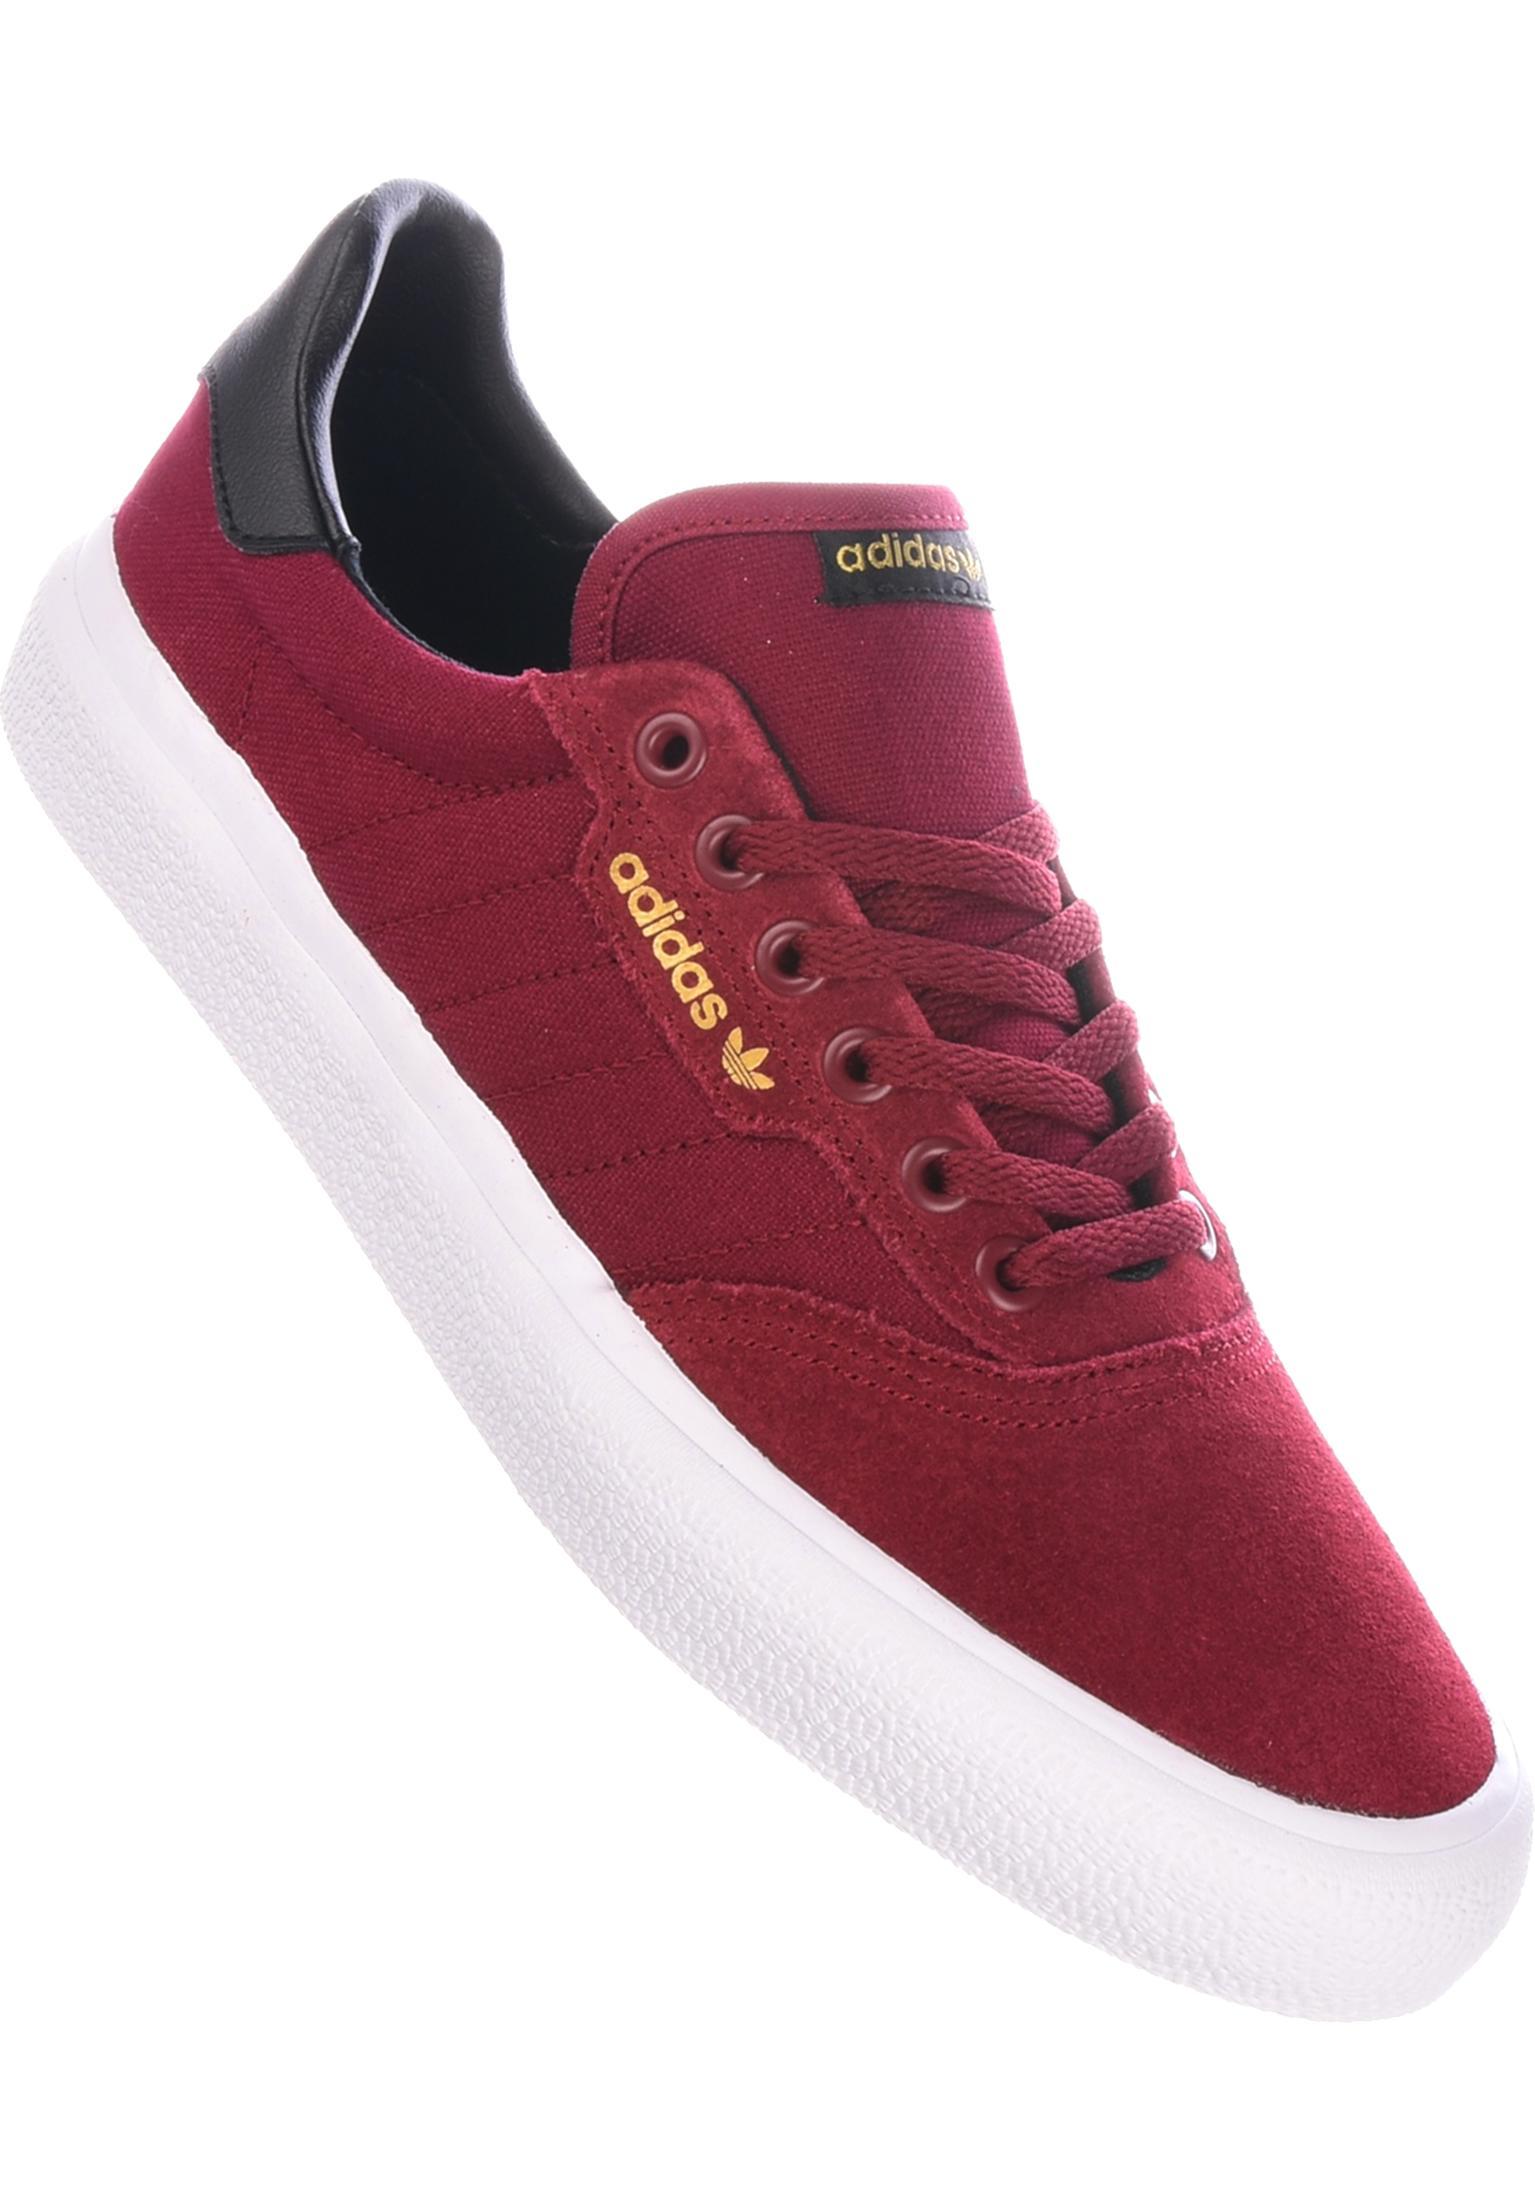 3MC adidas-skateboarding Tutte le scarpe in burgundy-coreblack-gold da Uomo   72ba018e67e